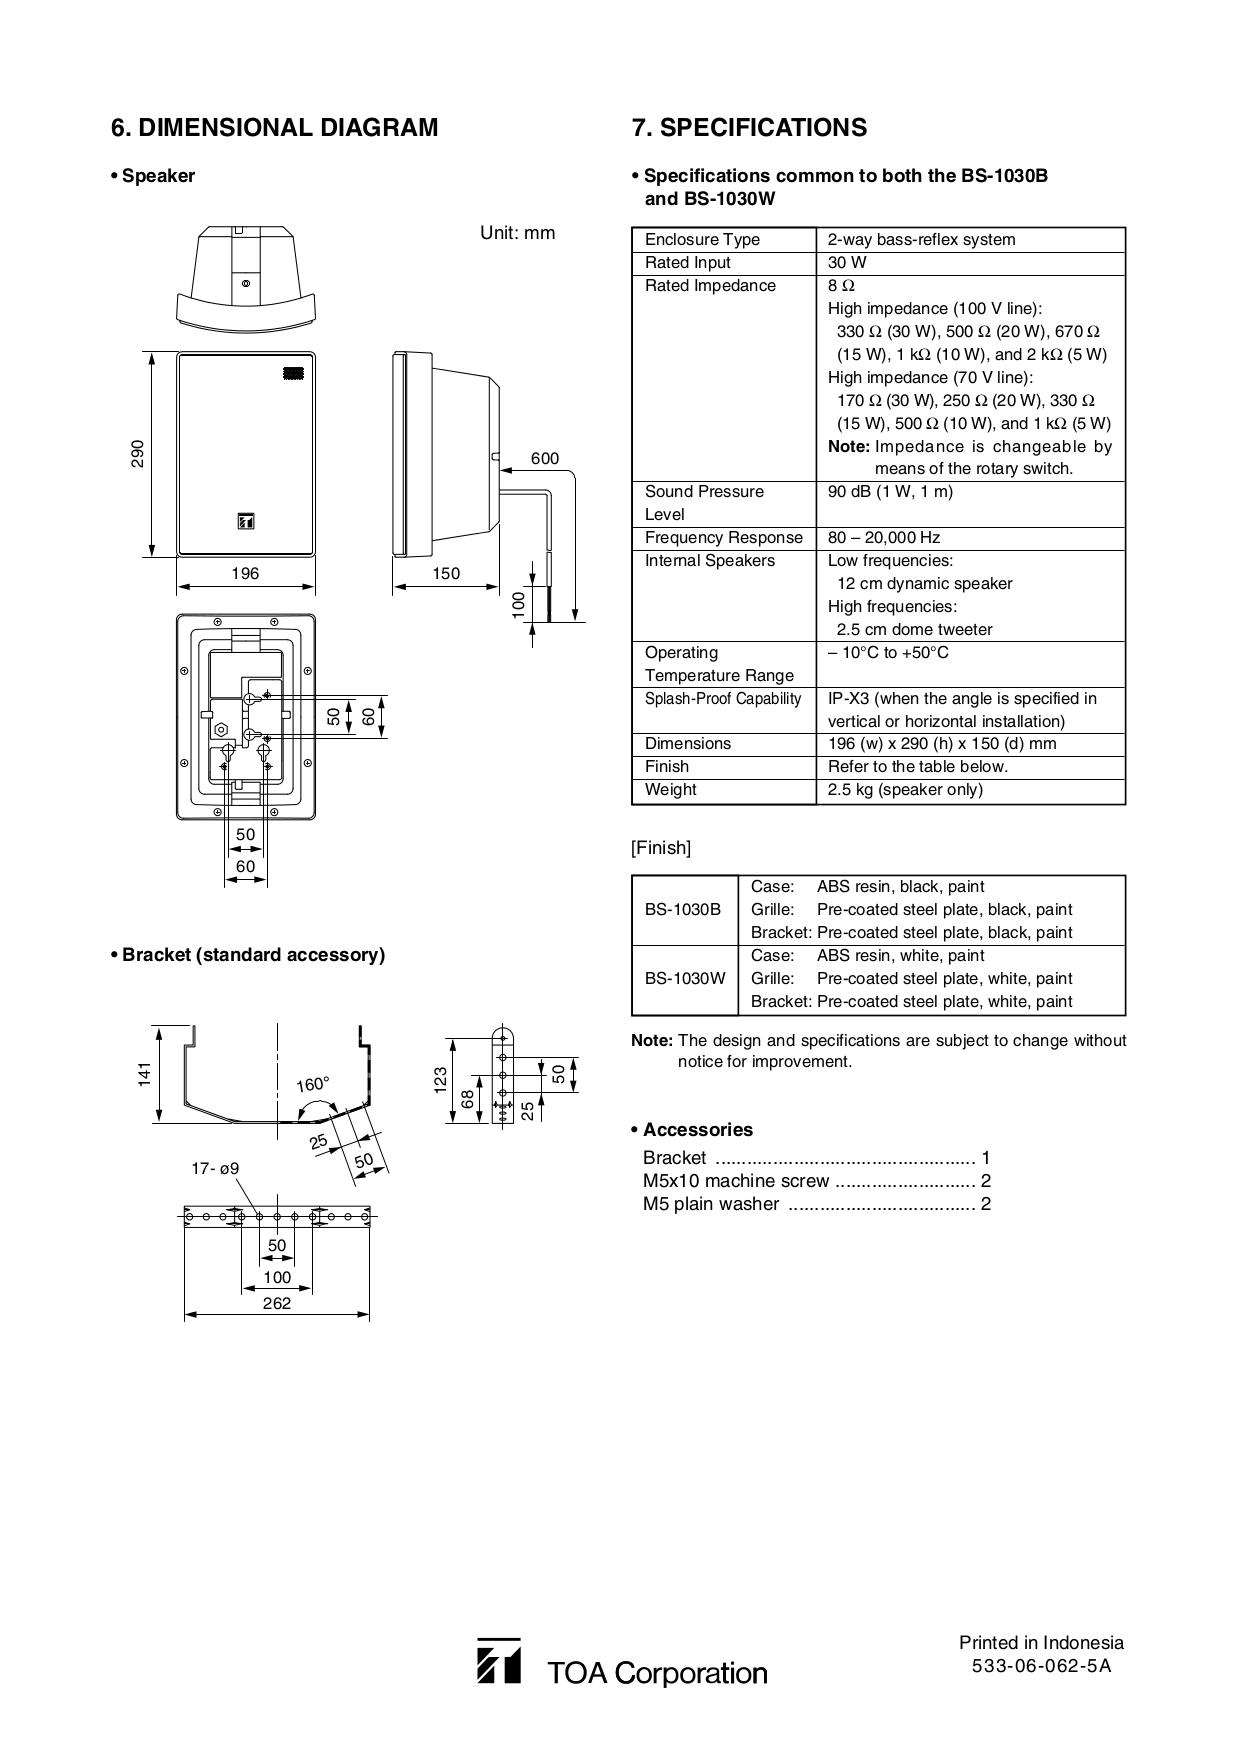 Pc 5005 manual